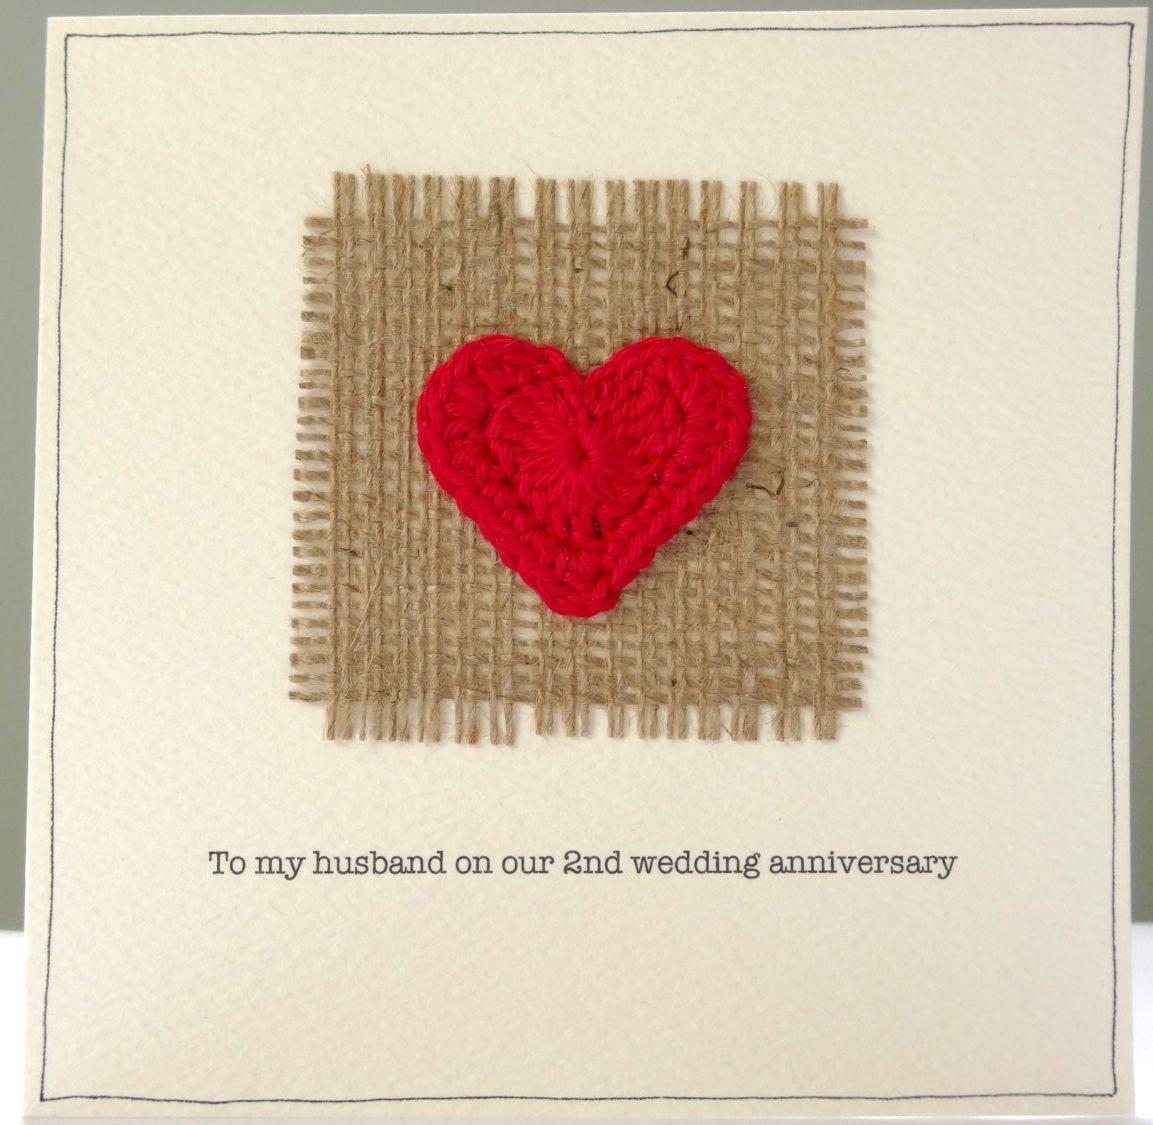 2nd Wedding Anniversary Card Romantic Hessian And Red Heart Etsy 2nd Wedding Anniversary Wedding Anniversary Cards Wedding Anniversary